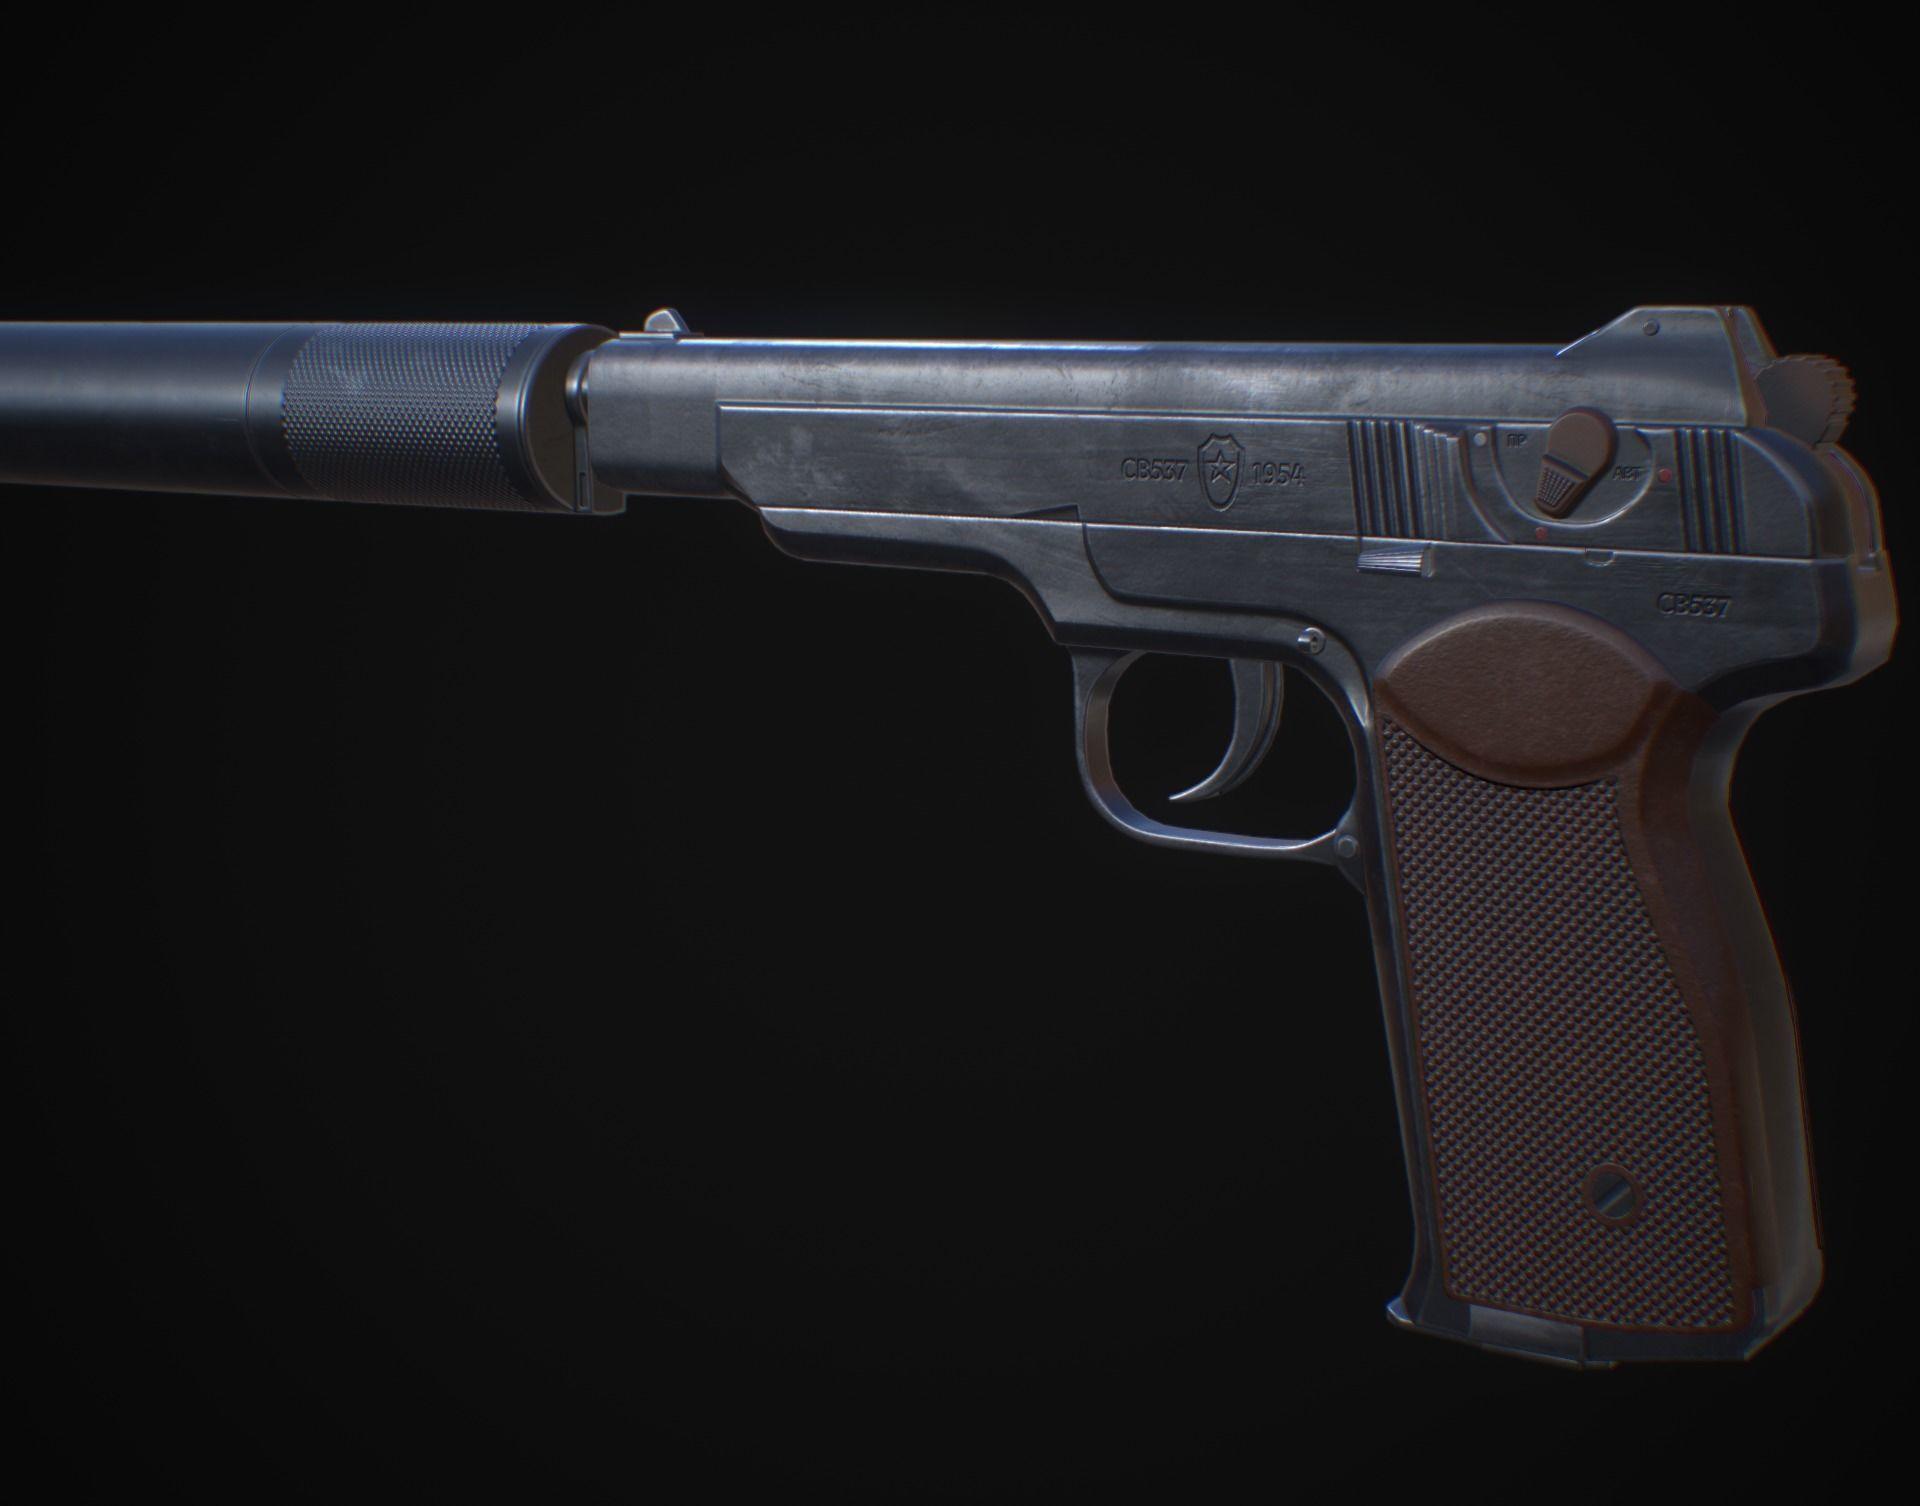 APB - APS Stechkin automatic pistol